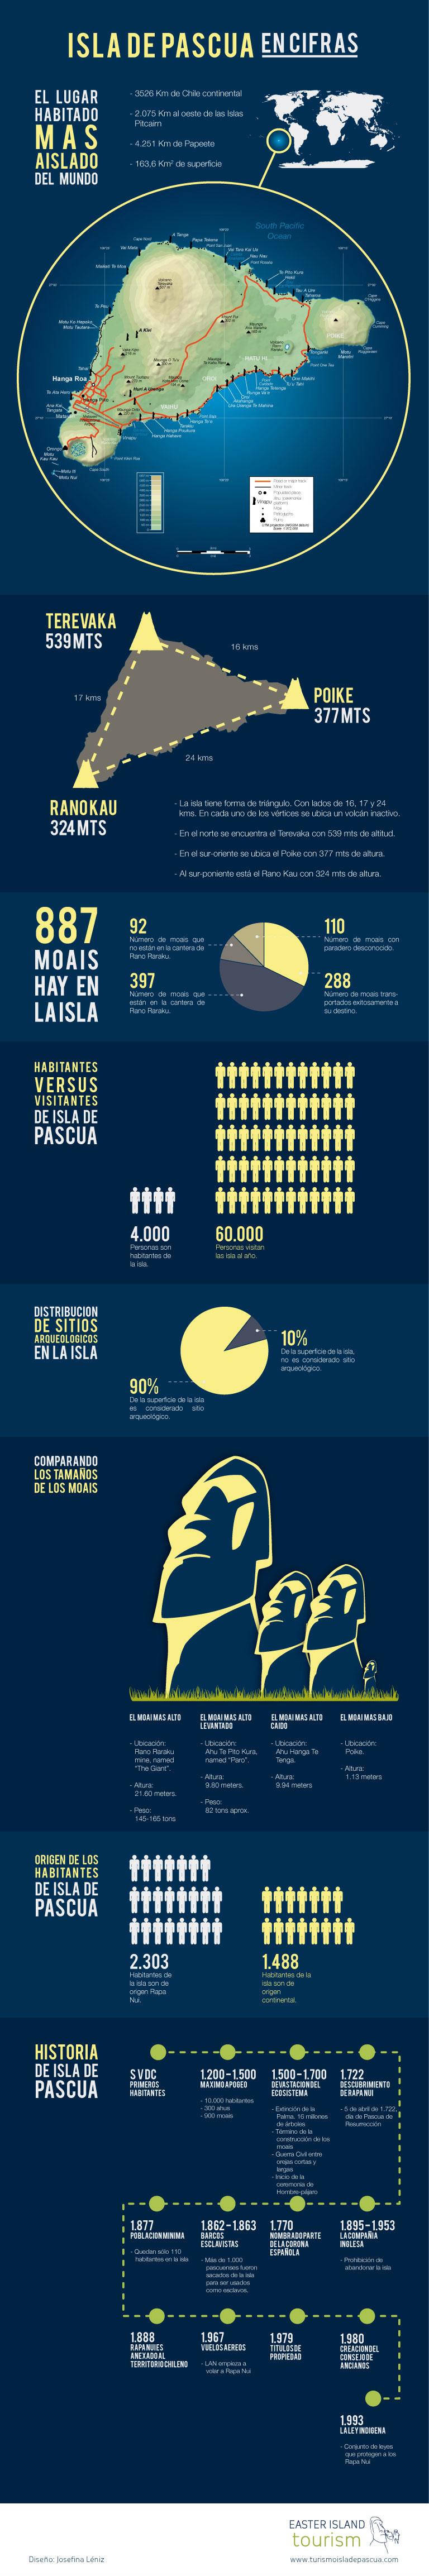 Infografia Isla de Pascua